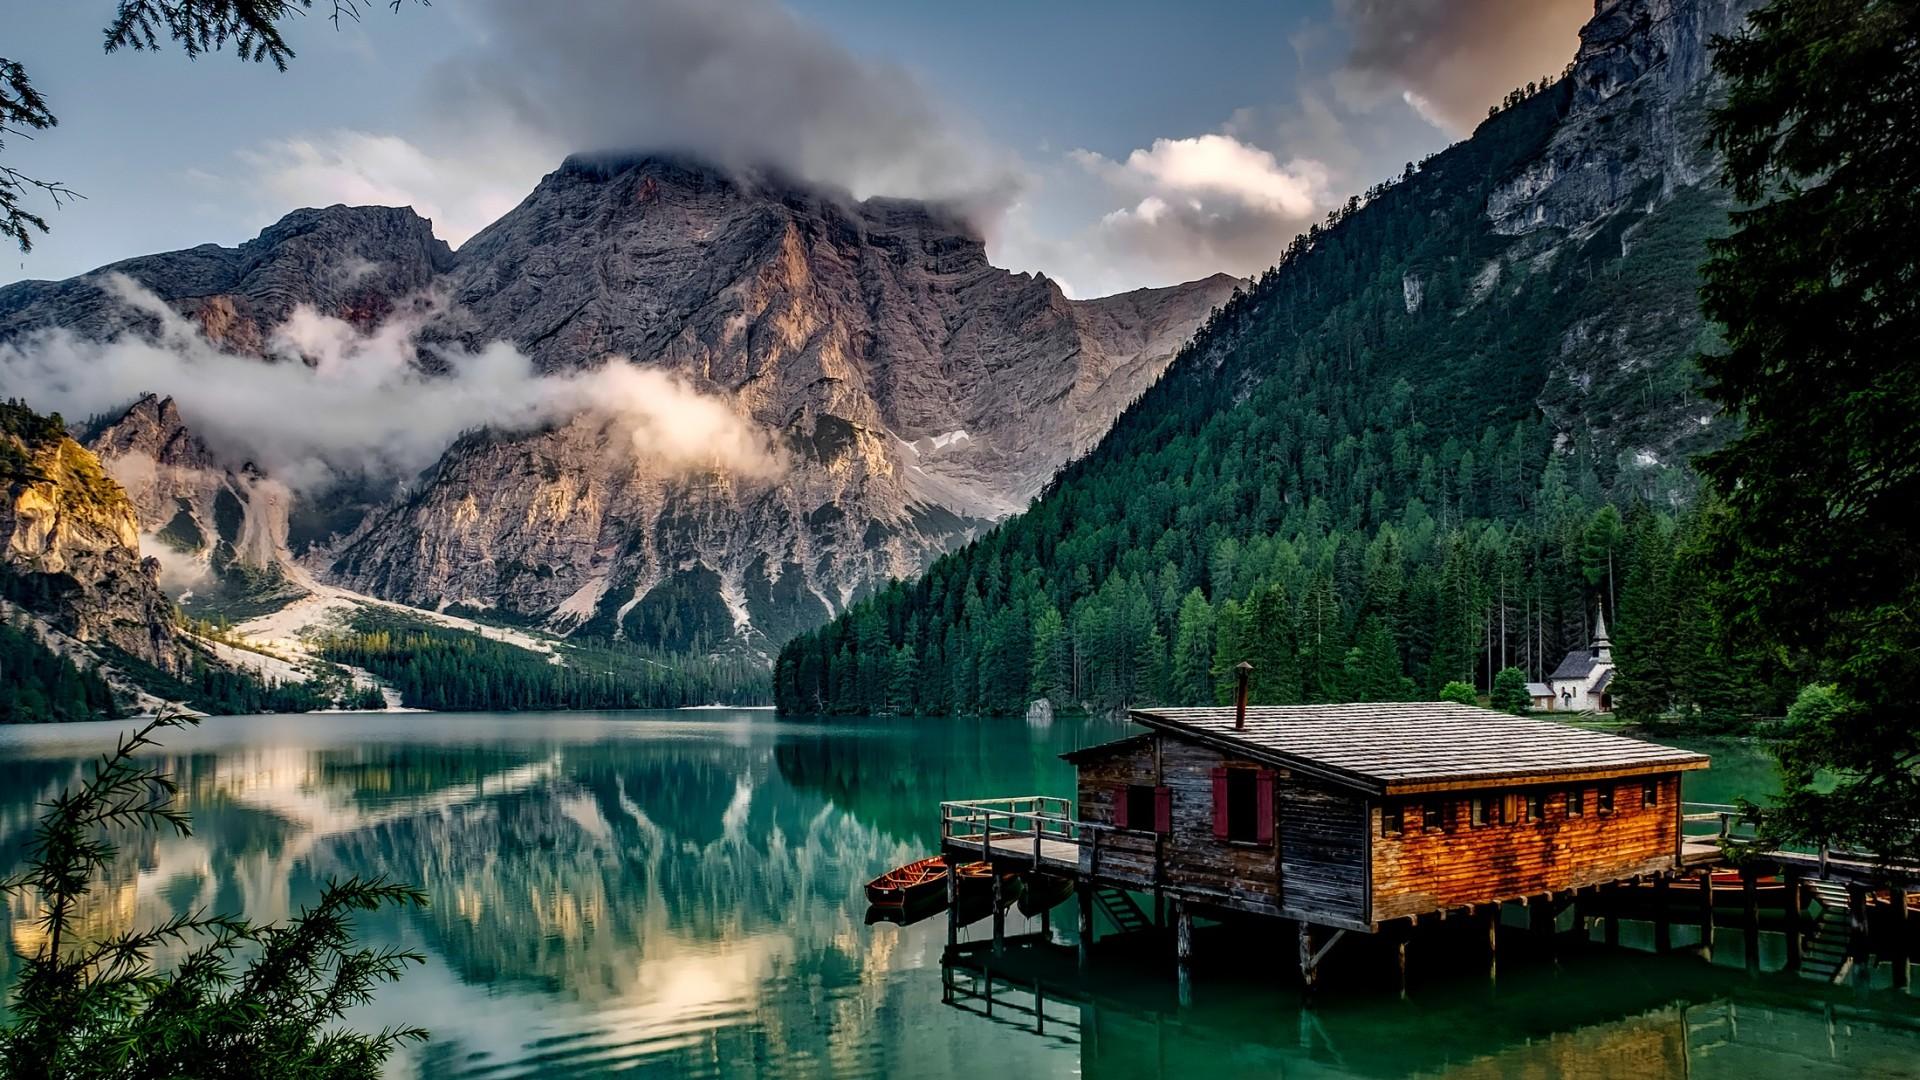 Wonderful Wallpaper Mountain Computer - landscape-mountains-boat-Italy-lake-nature-building-reflection-clouds-house-morning-fjord-wilderness-Alps-mountain-computer-wallpaper-mountainous-landforms-landform-mountain-range-25450  Snapshot_701277.jpg